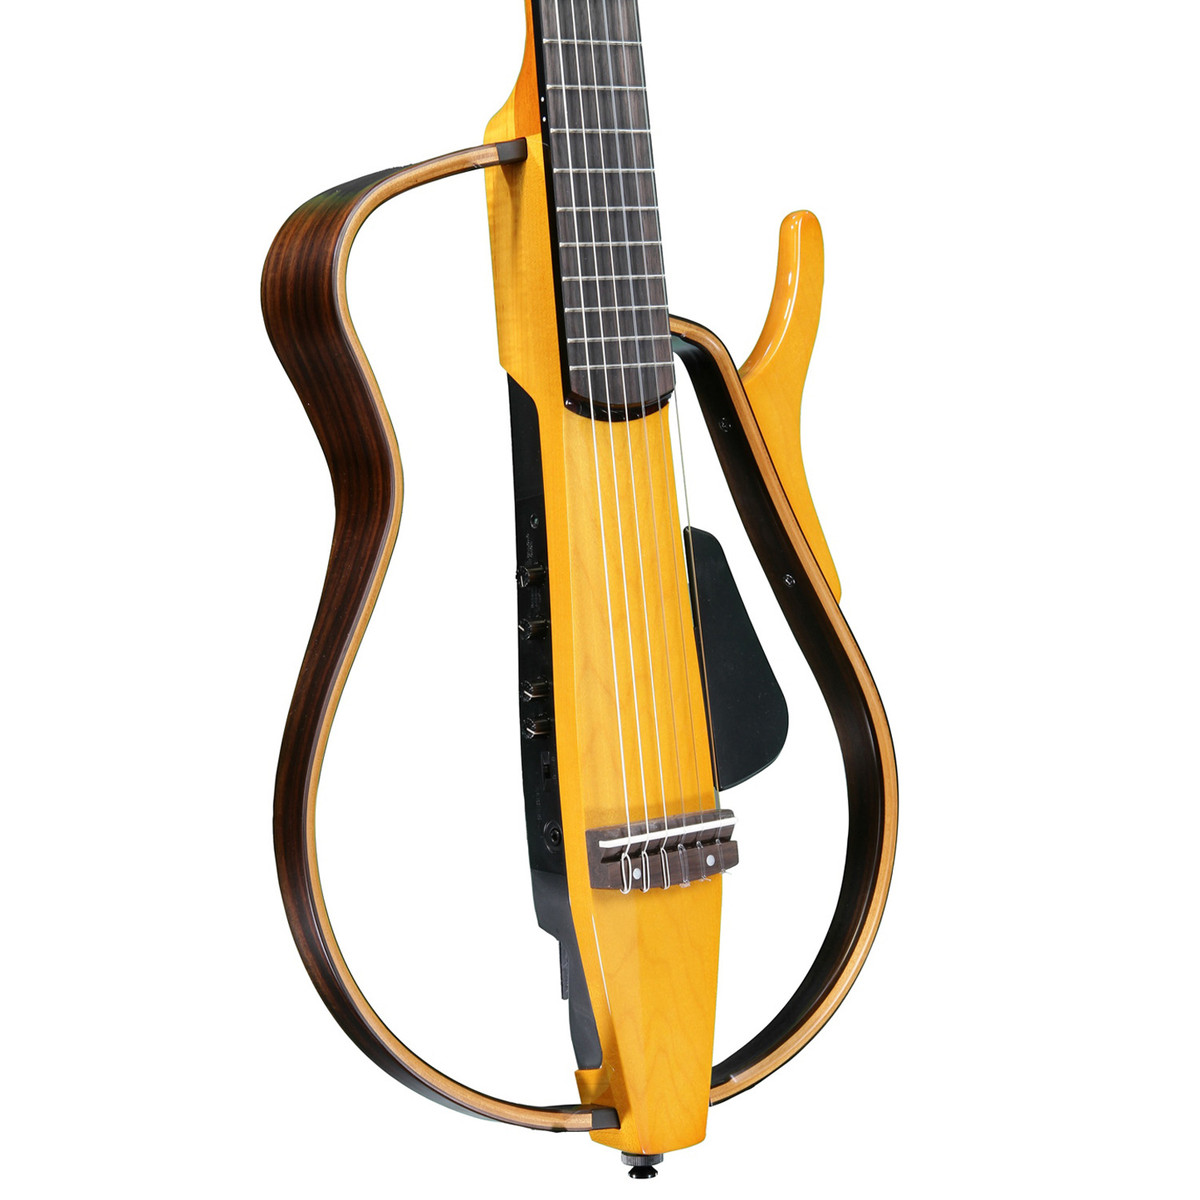 Yamaha slg130nw silent guitar light amber burst b stock for Yamaha silent guitar slg130nw